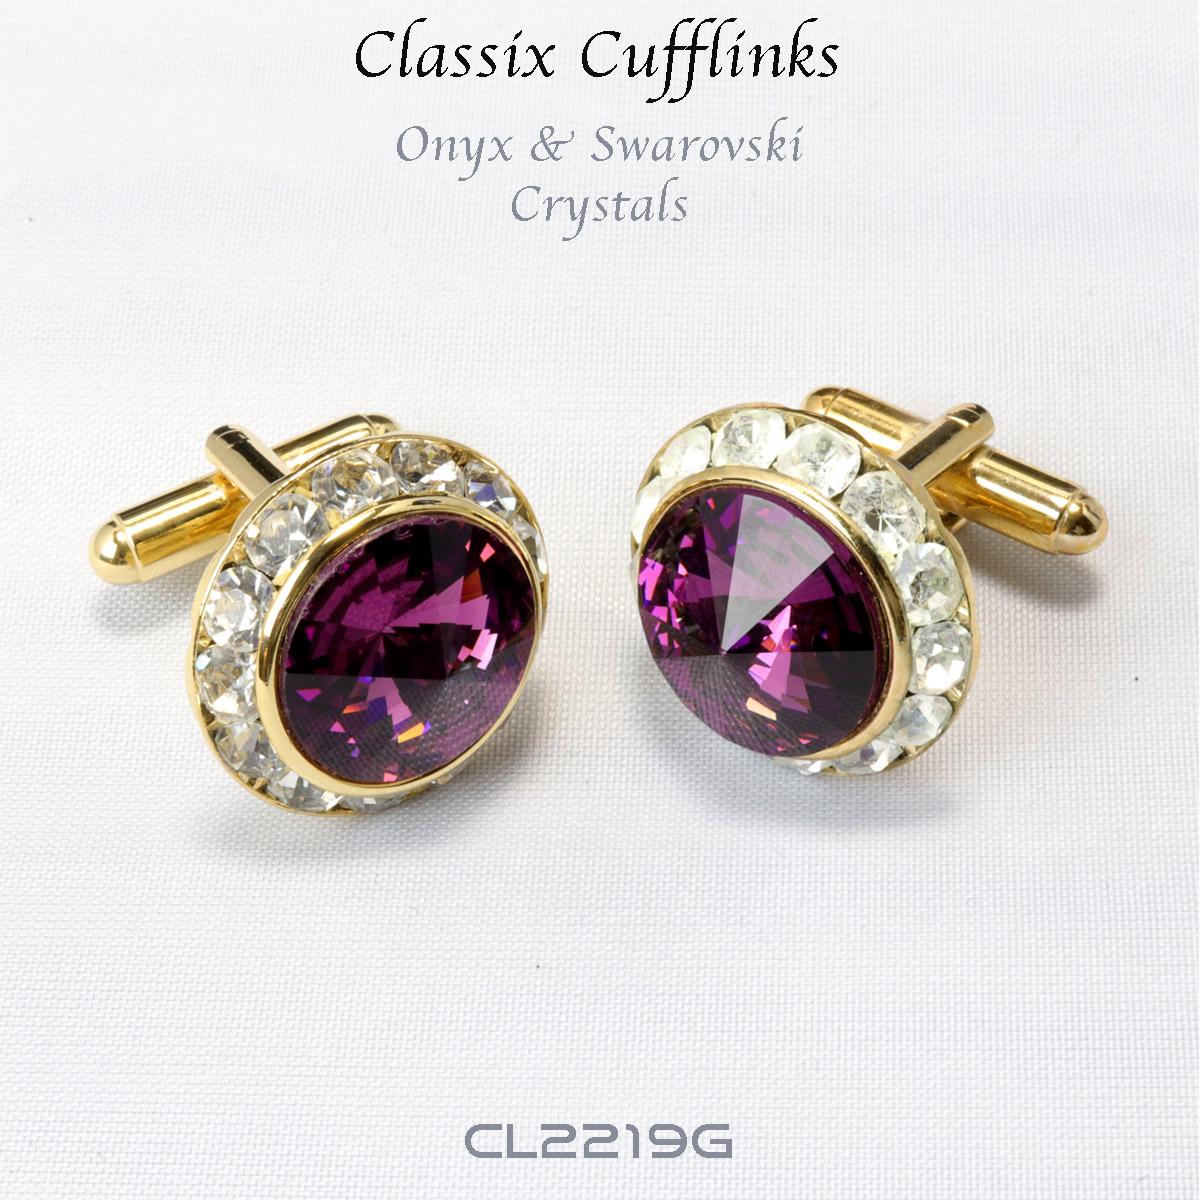 cobertura Larva del moscardón Tender  Red Swarovski Crystal Cufflinks in CA, NY, - Moda Italy Fashion